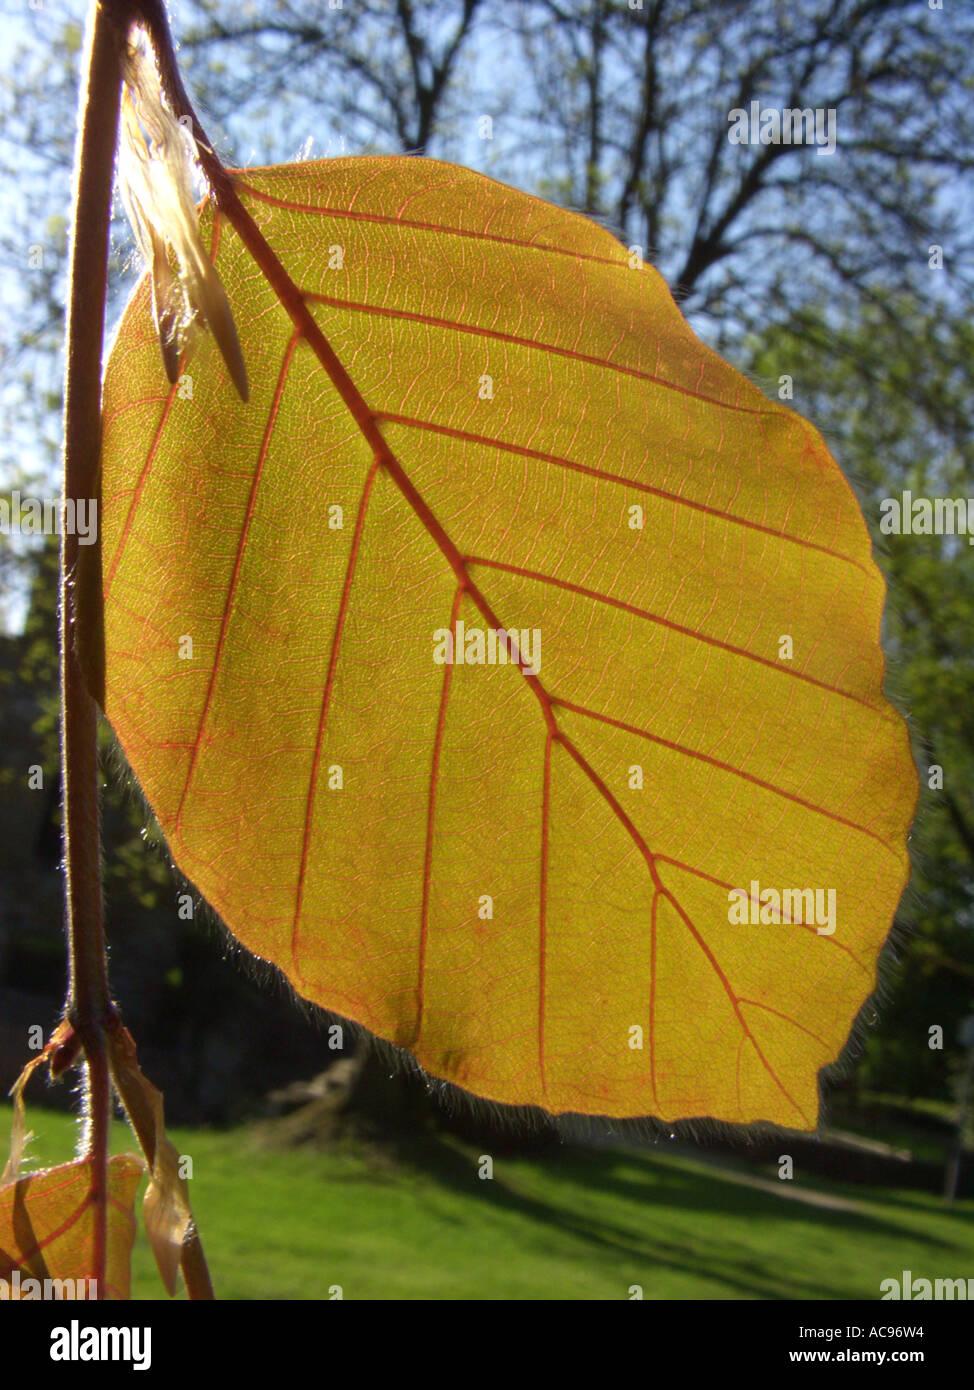 common beech (Fagus sylvatica), cv. Purpurea Pendula: leaf margin in backlight - Stock Image